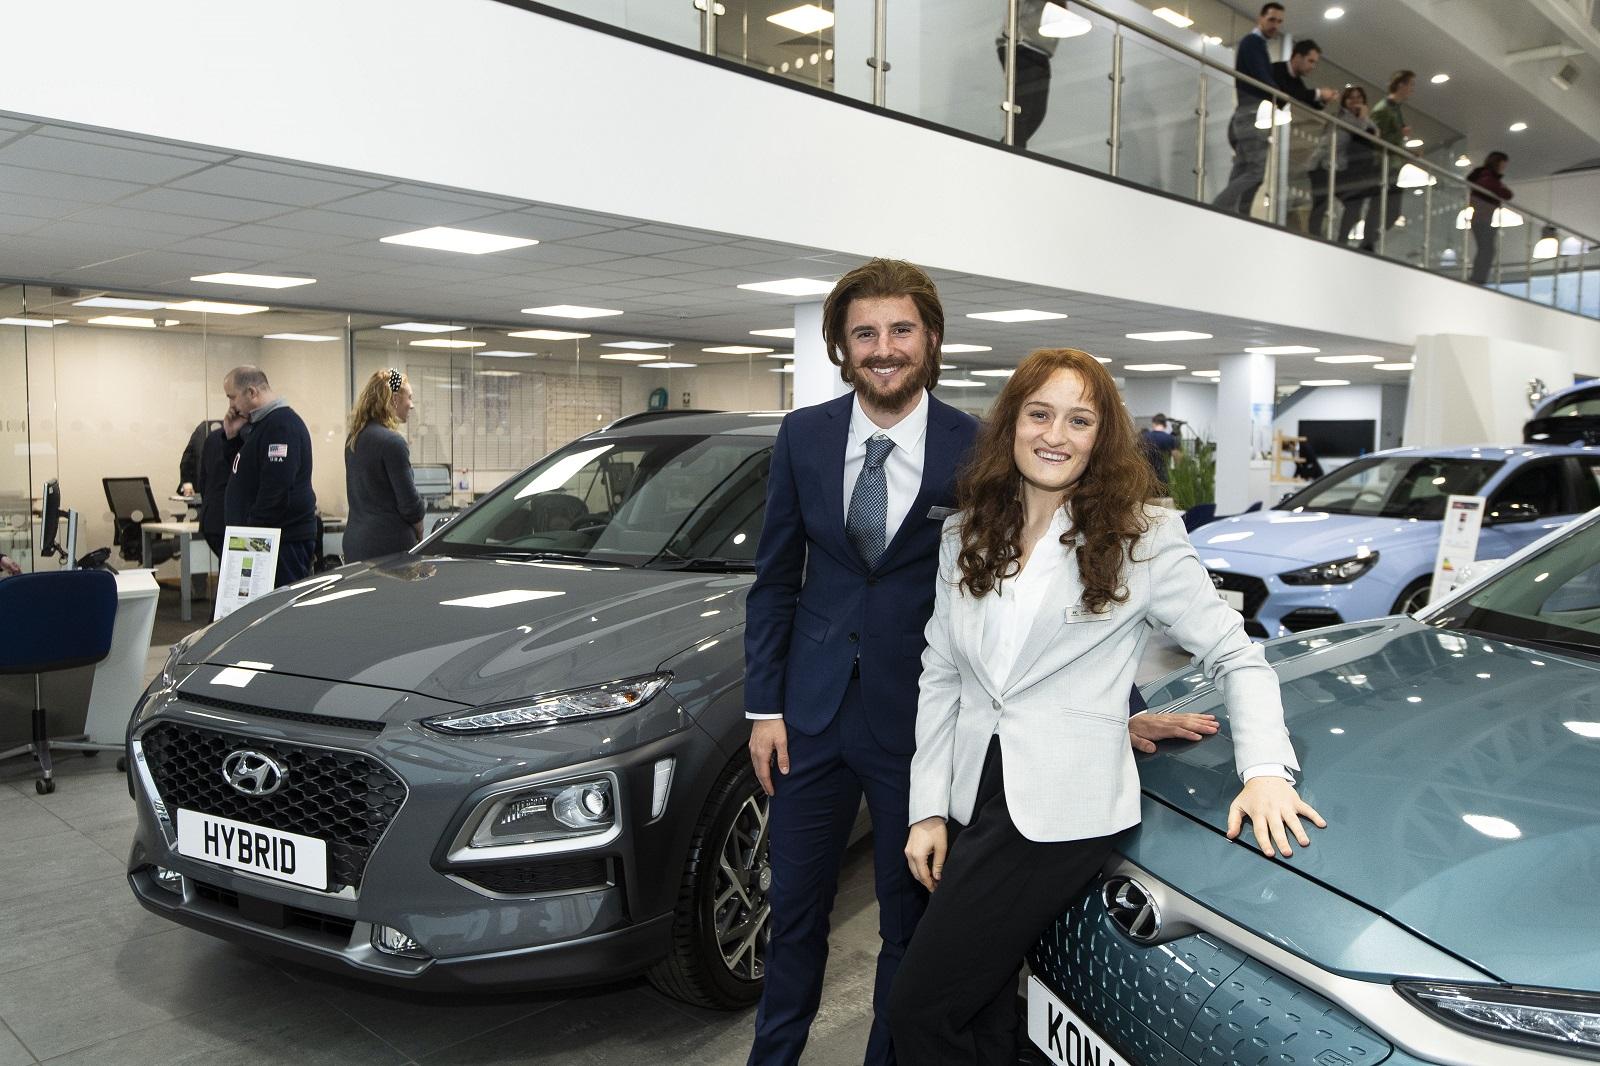 Erin and Mason disguised as Hyundai car dealers